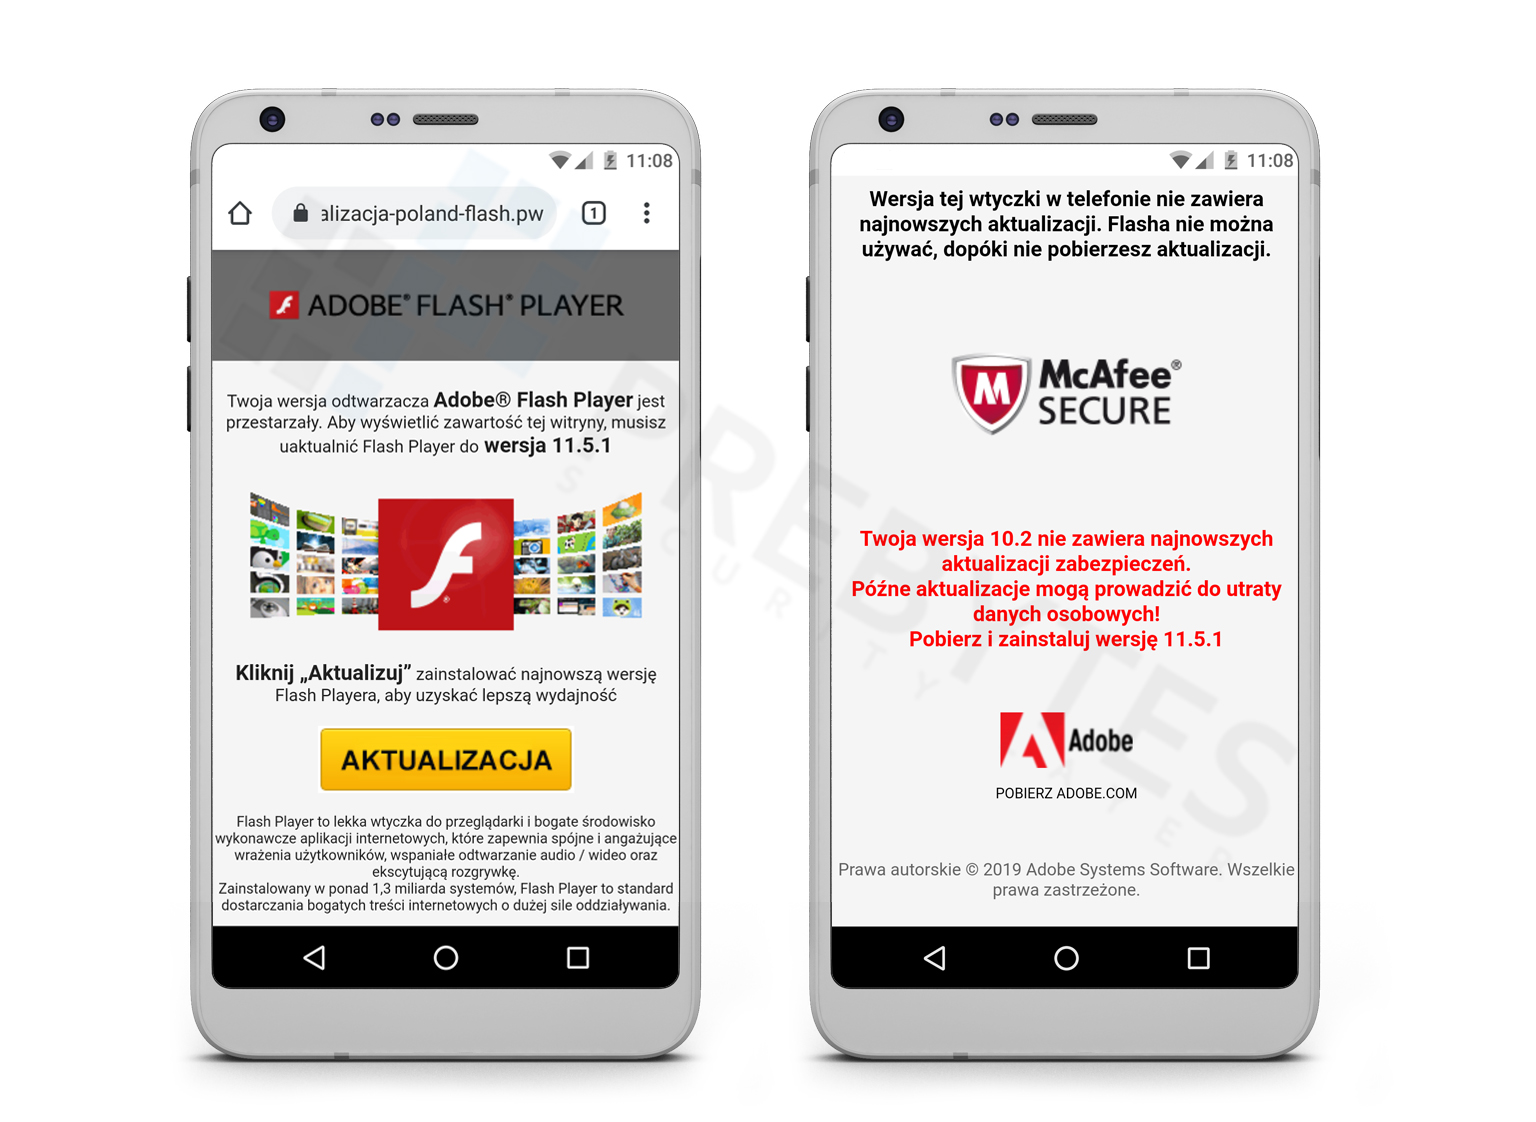 aktualizacja-poland-flash.pw